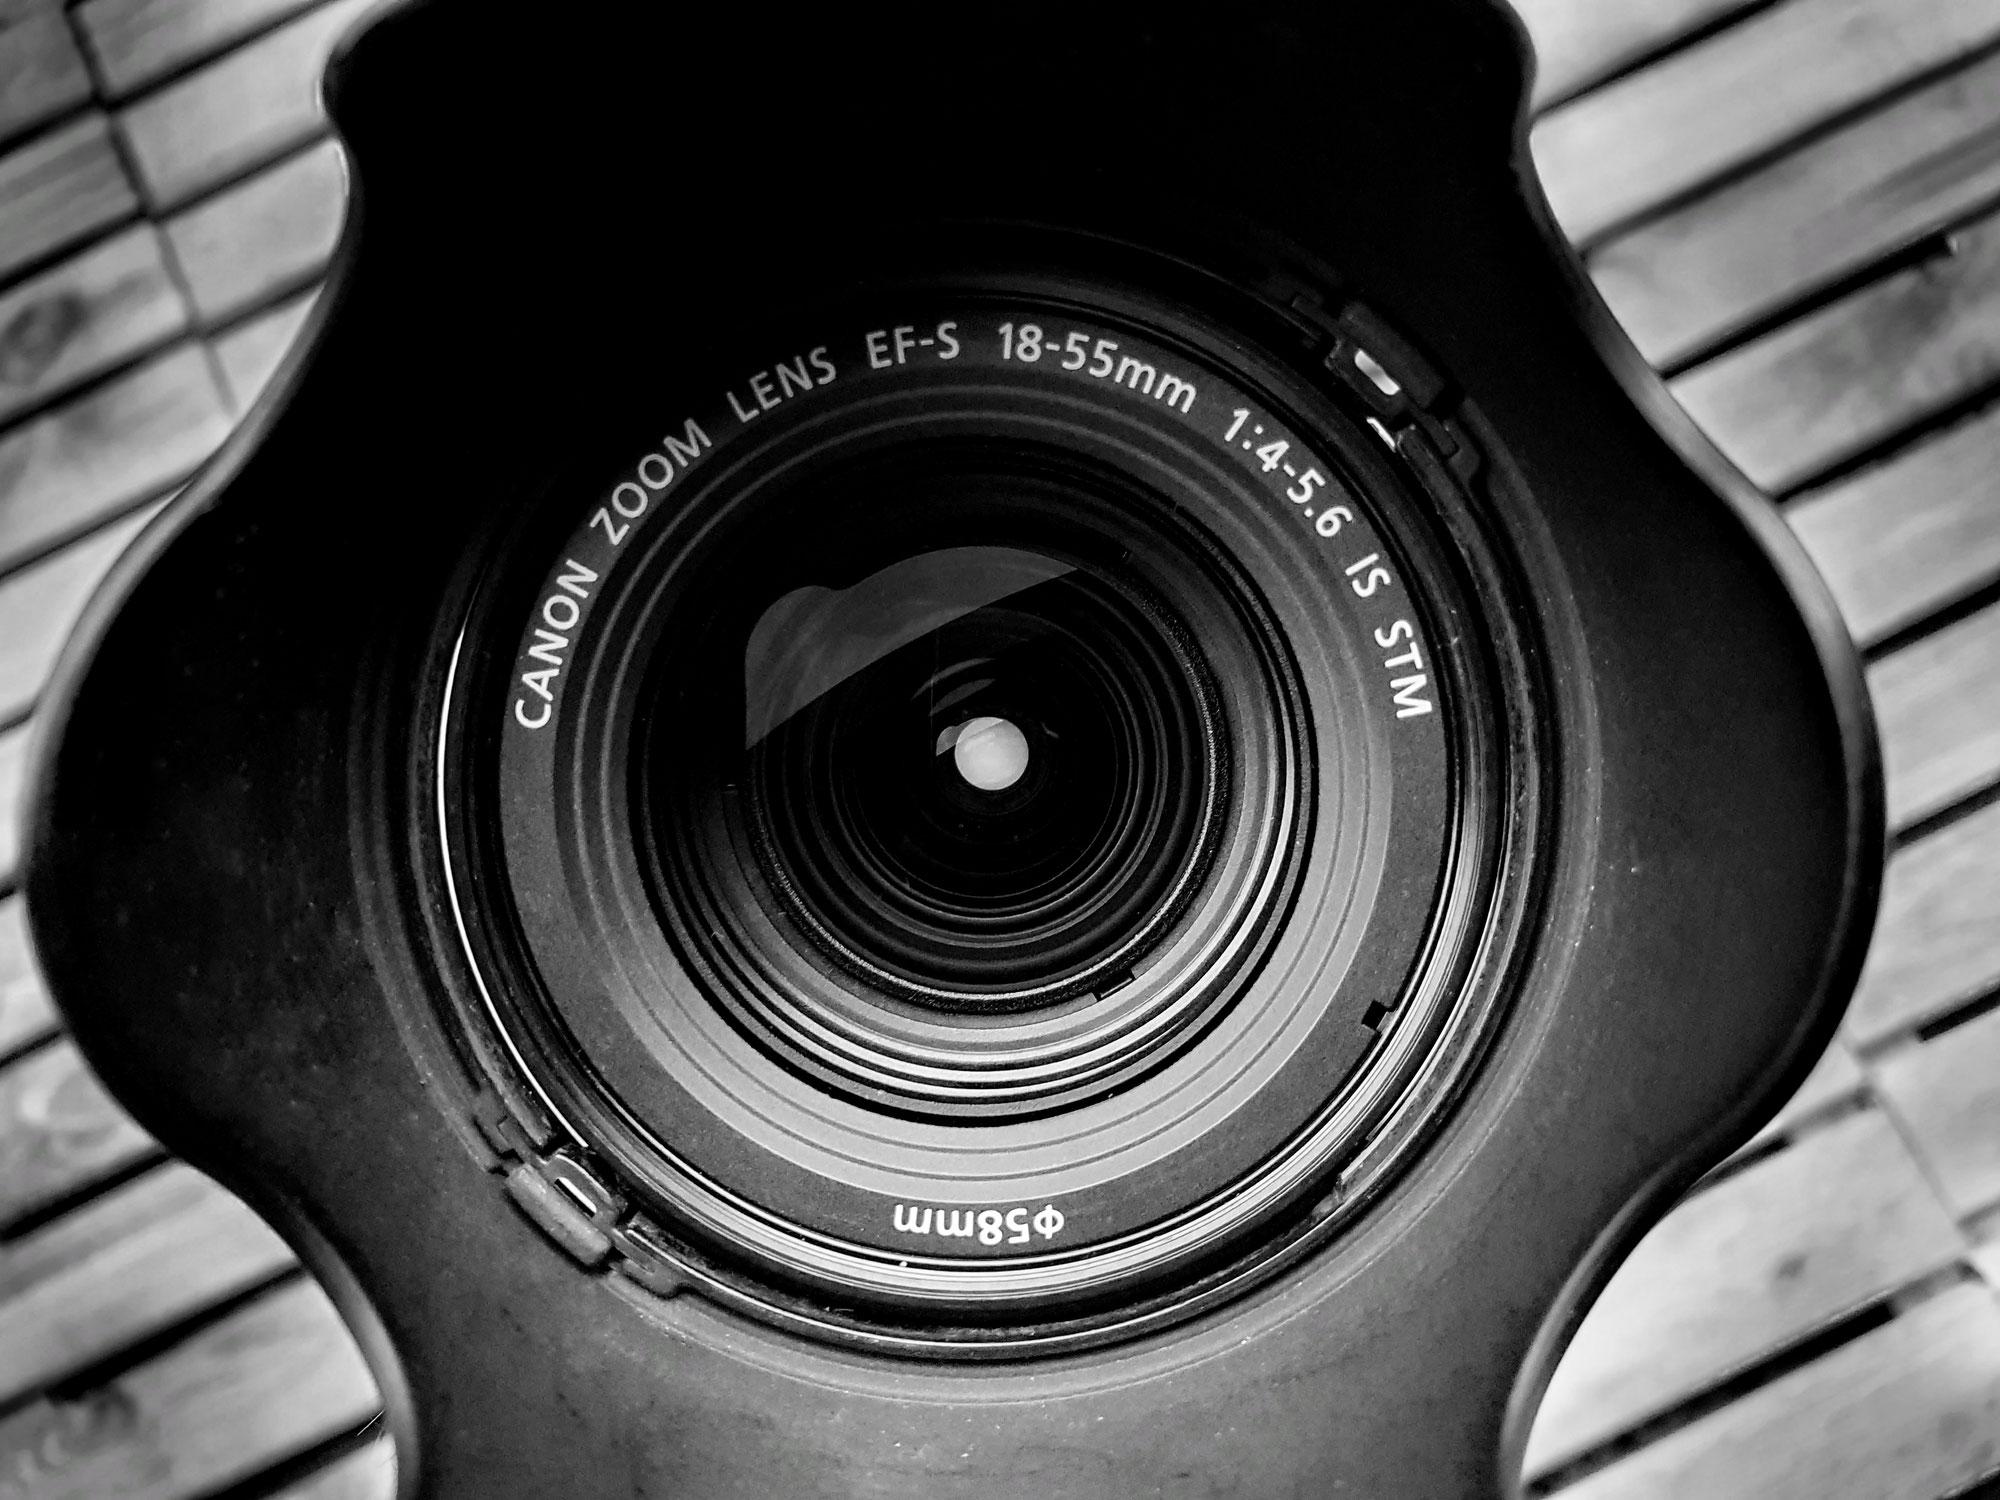 Podcast Folge 34 Schrottlinse oder geniale Idee - Das Kit-Objektiv